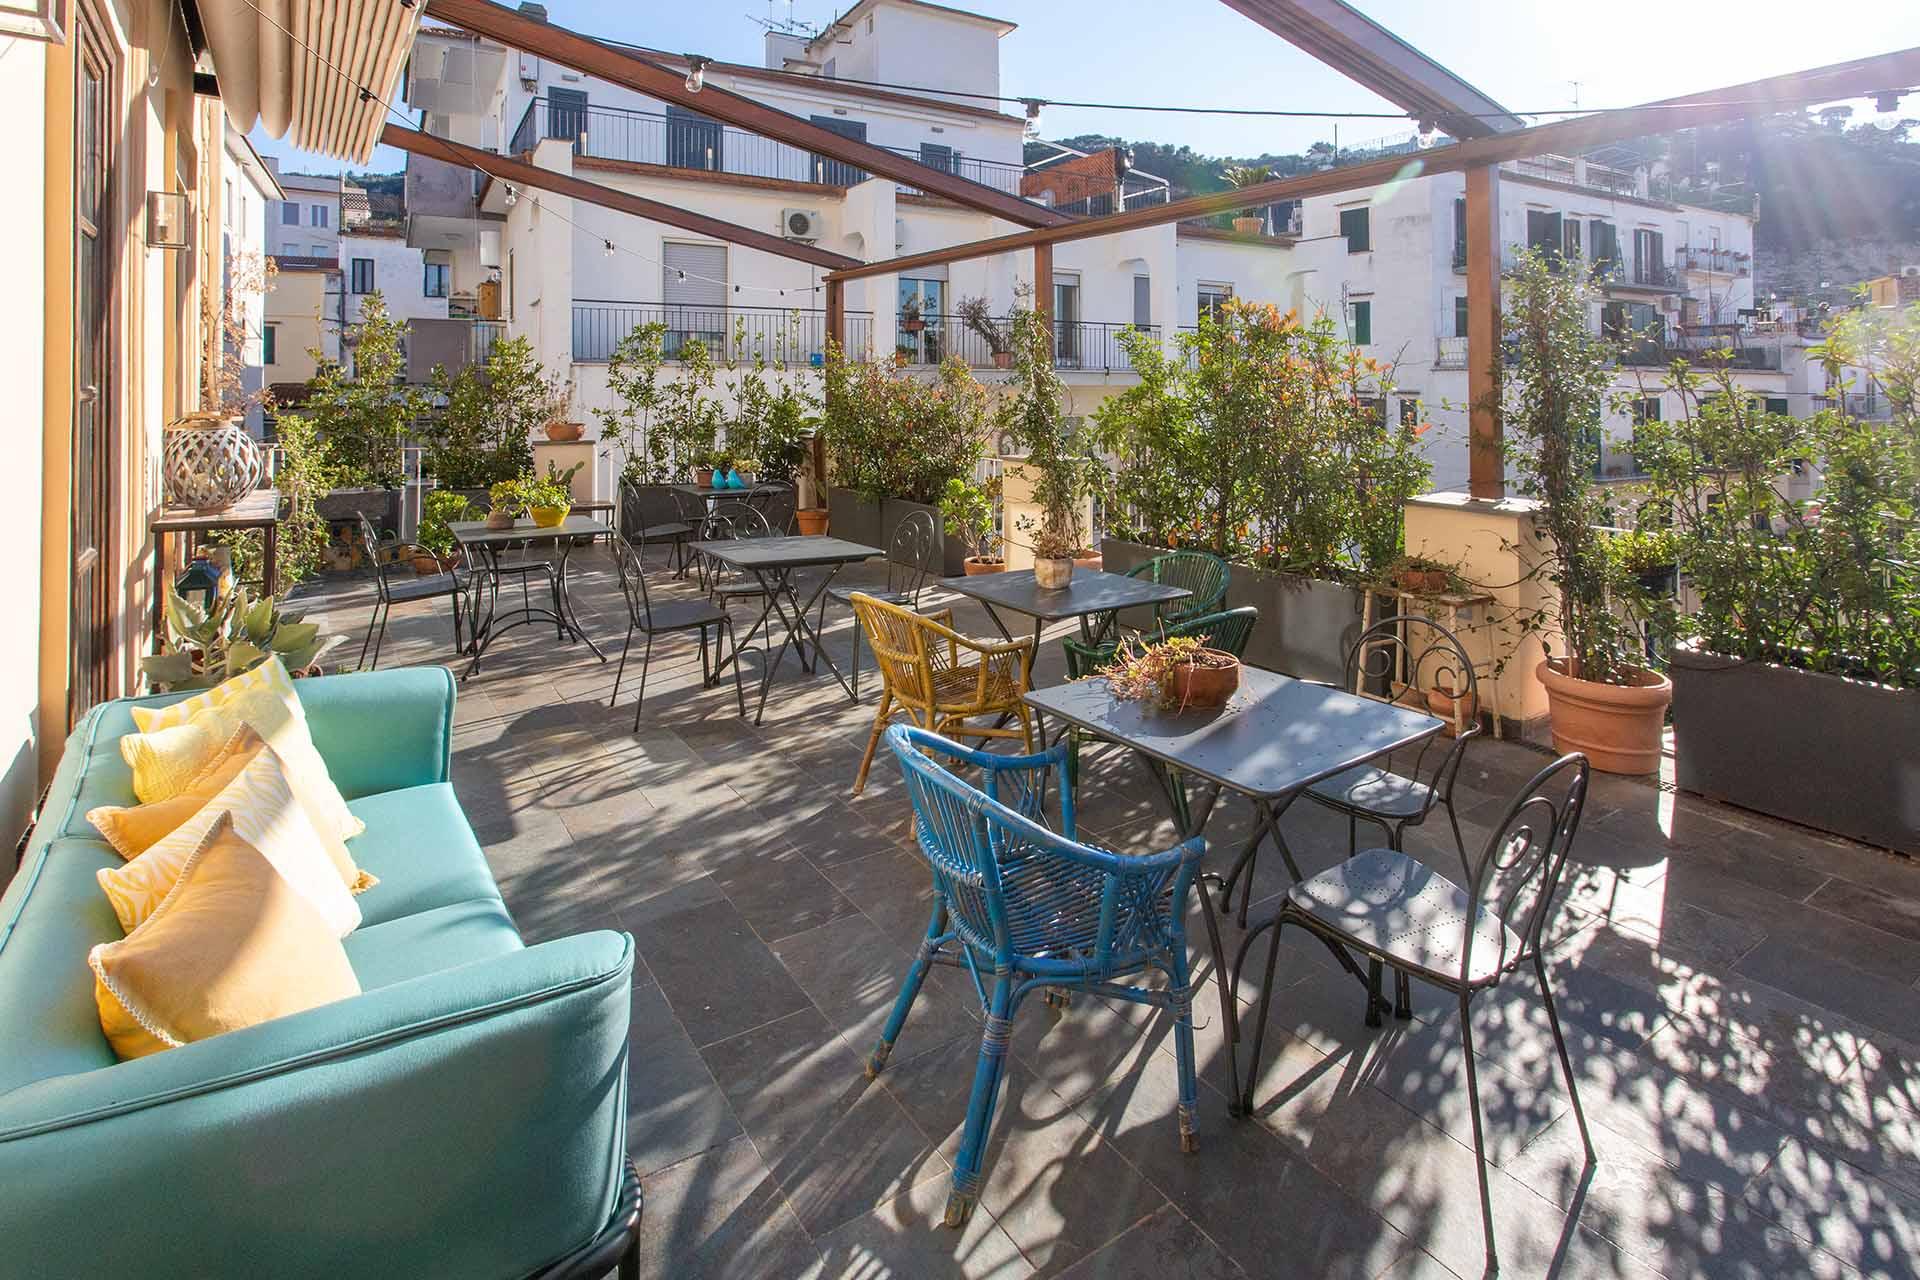 Accademia 39 terrace in Sorrento city center